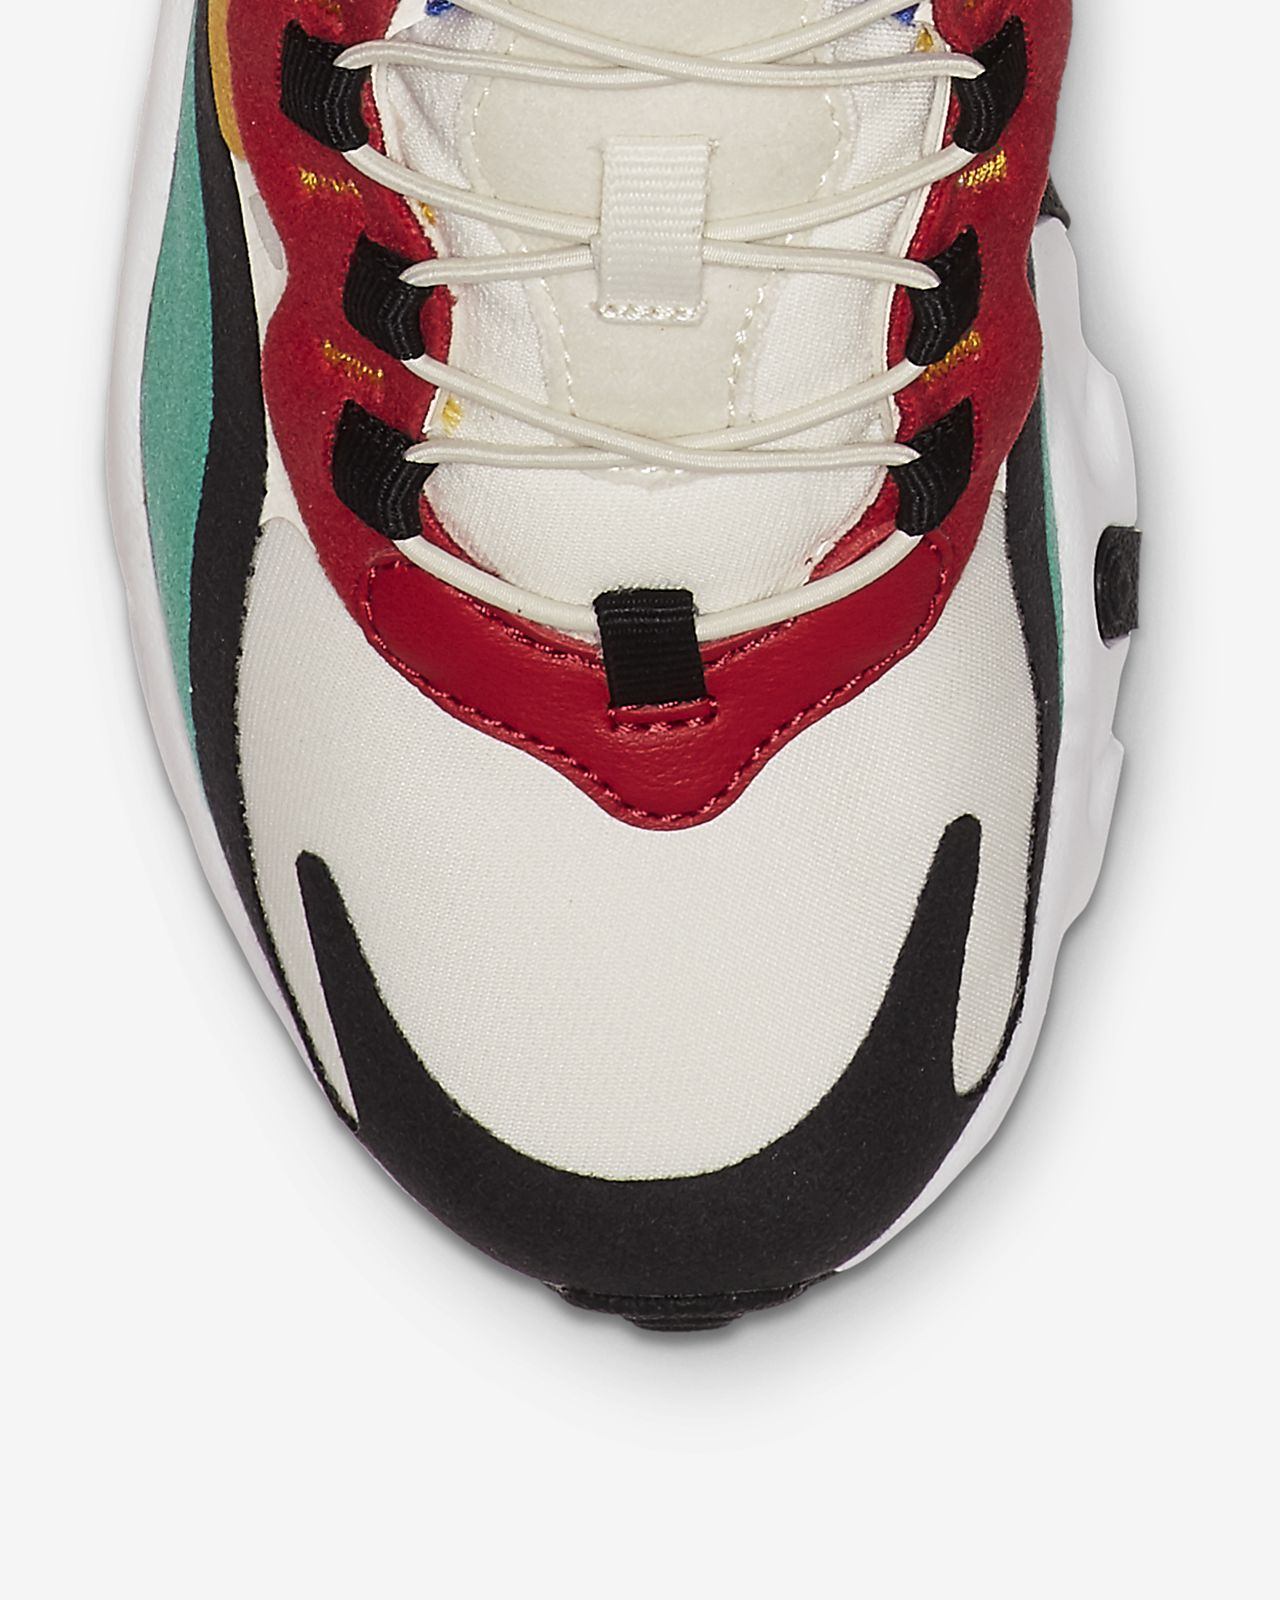 Calzado para niños talla pequeña Nike Air Max 270 RT